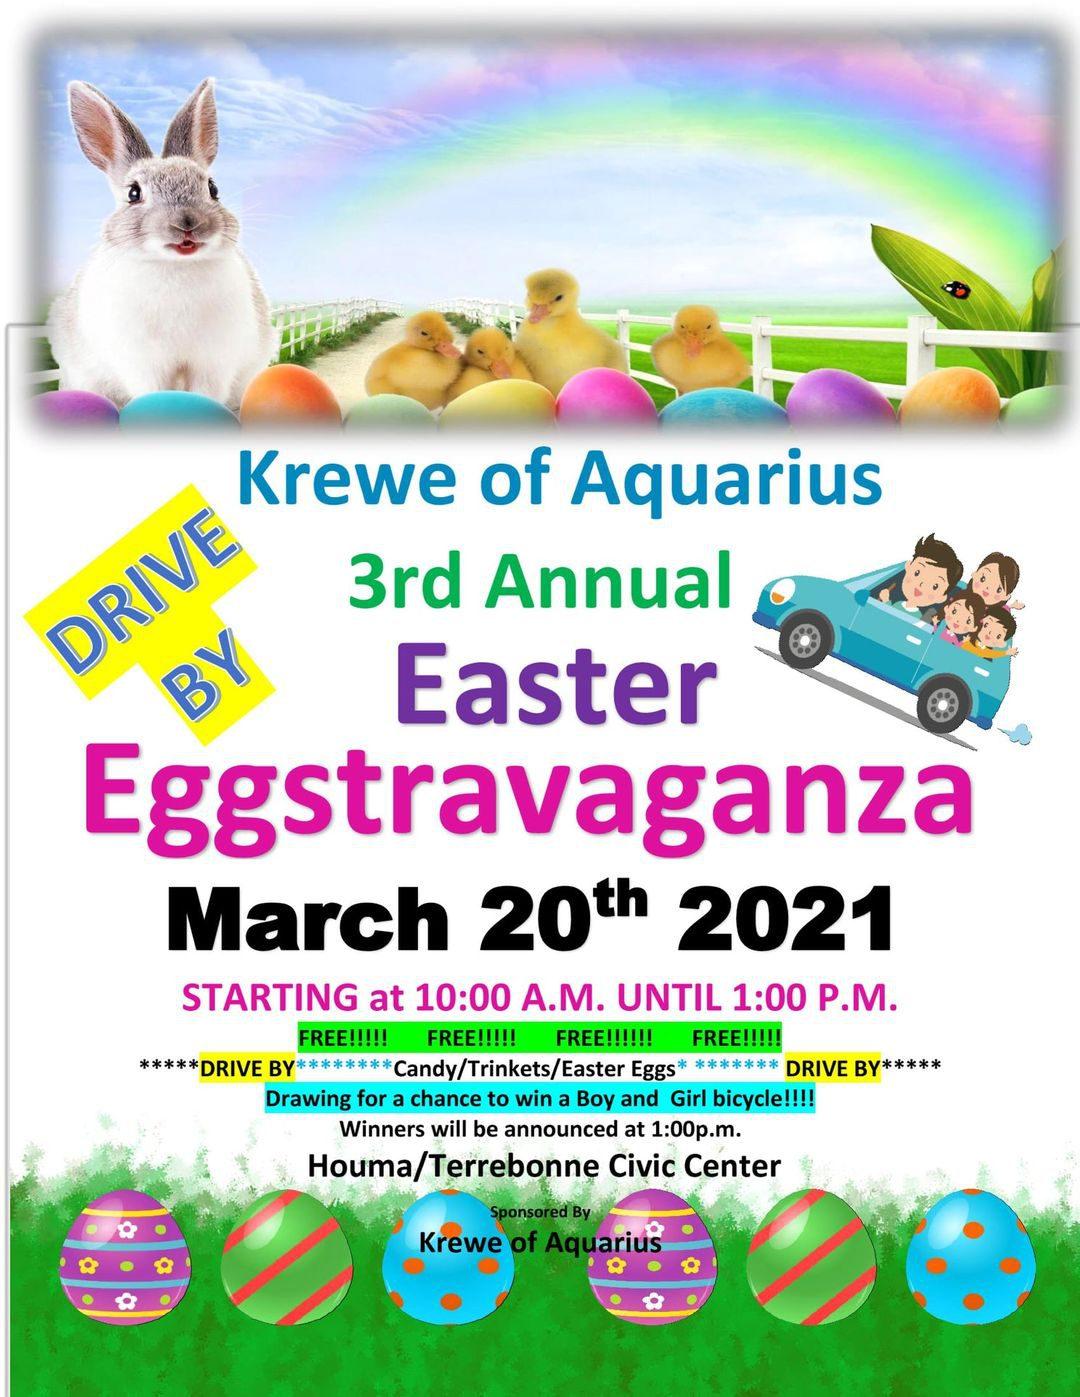 Easter Eggstravaganza Flyer